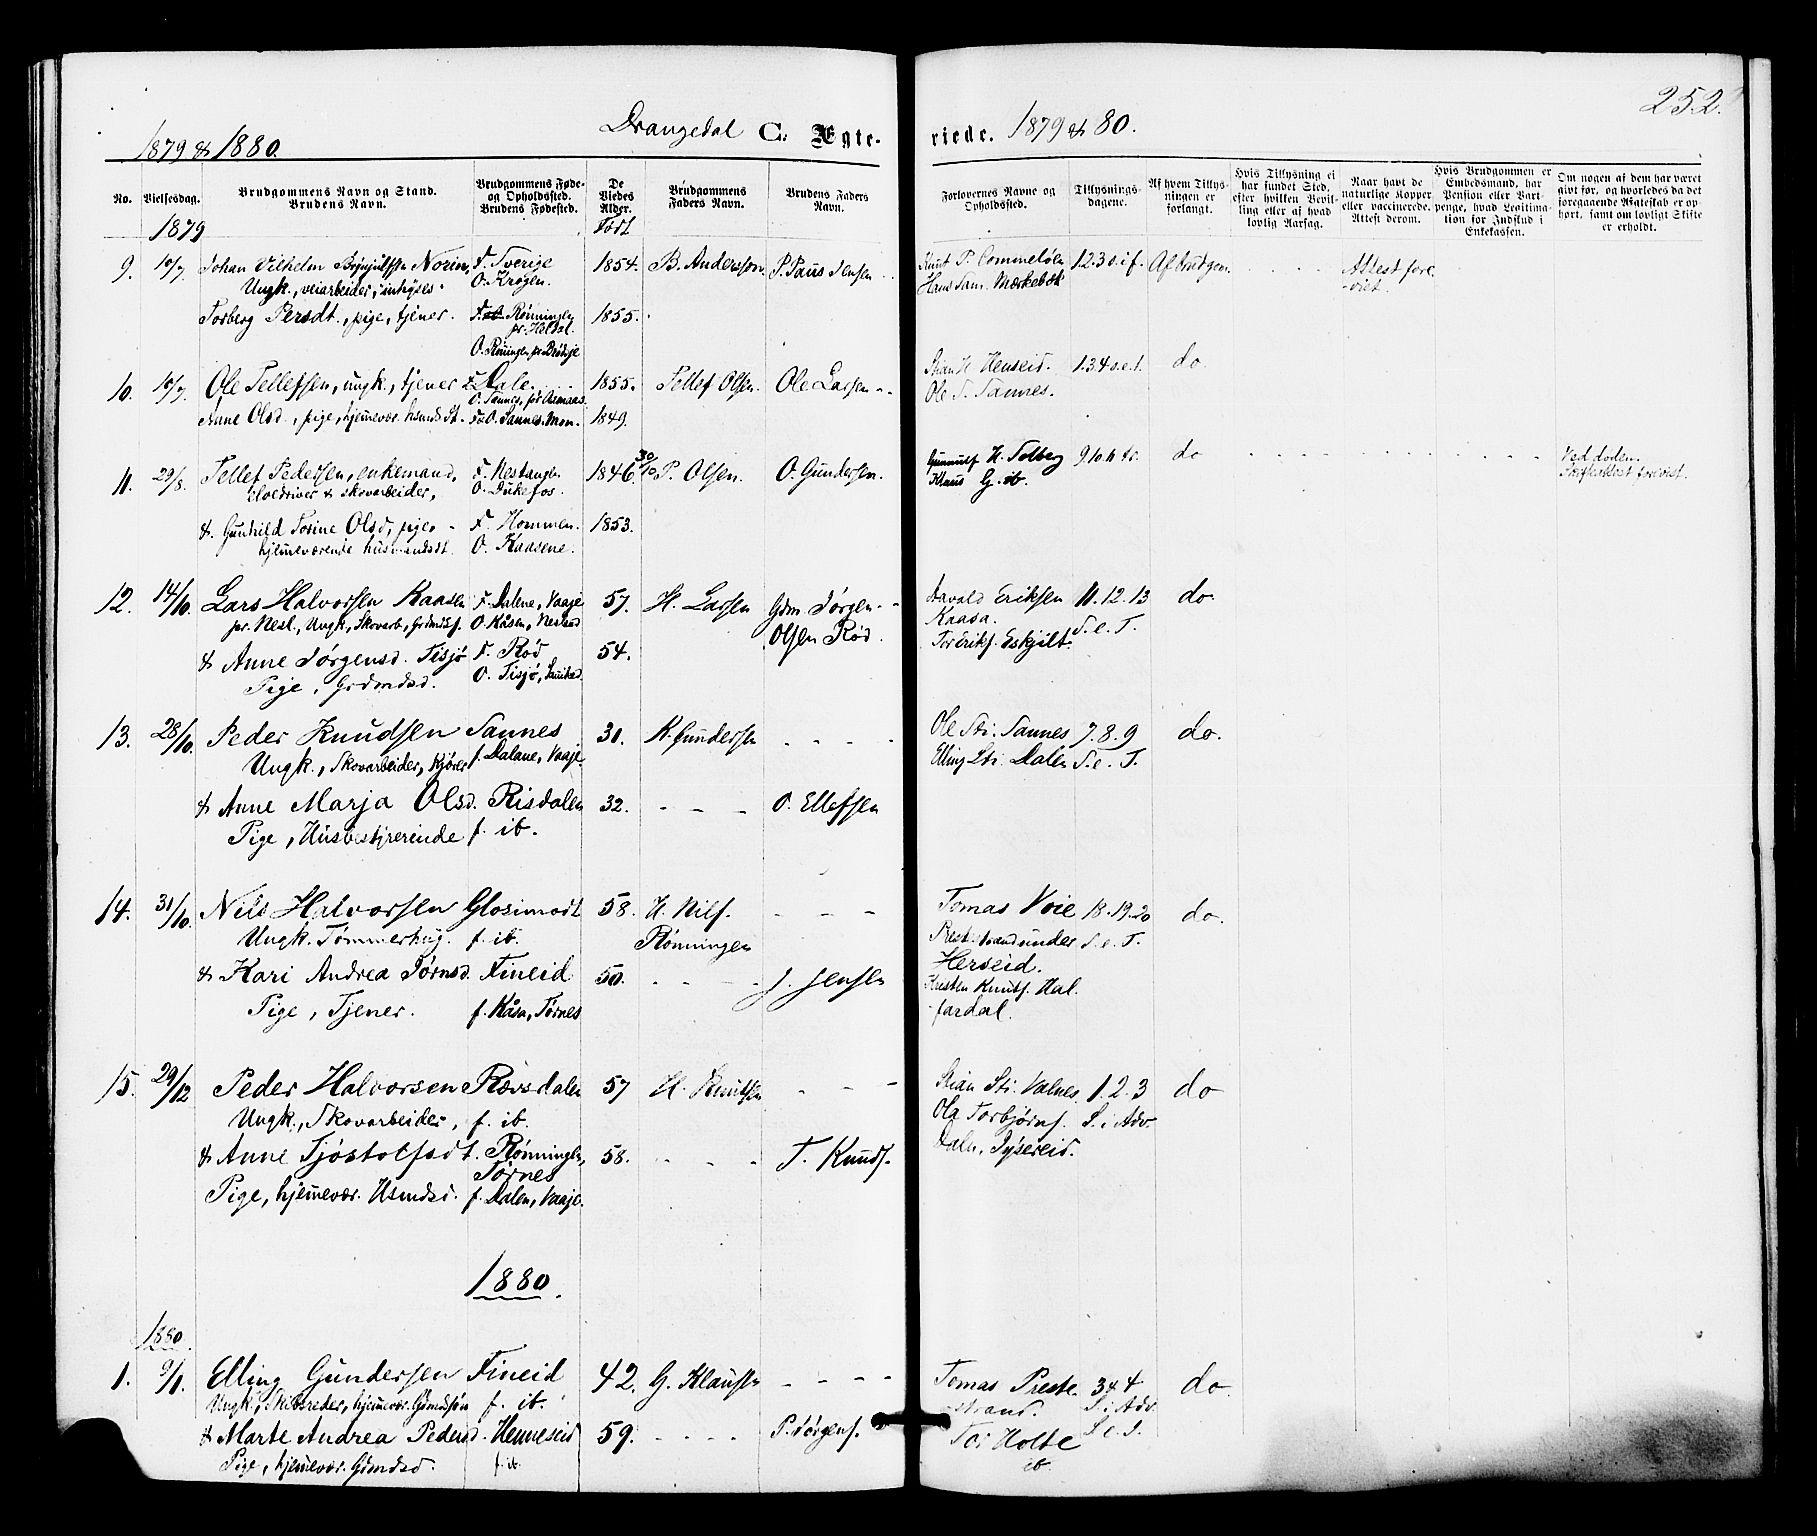 SAKO, Drangedal kirkebøker, F/Fa/L0009: Ministerialbok nr. 9 /1, 1872-1884, s. 252